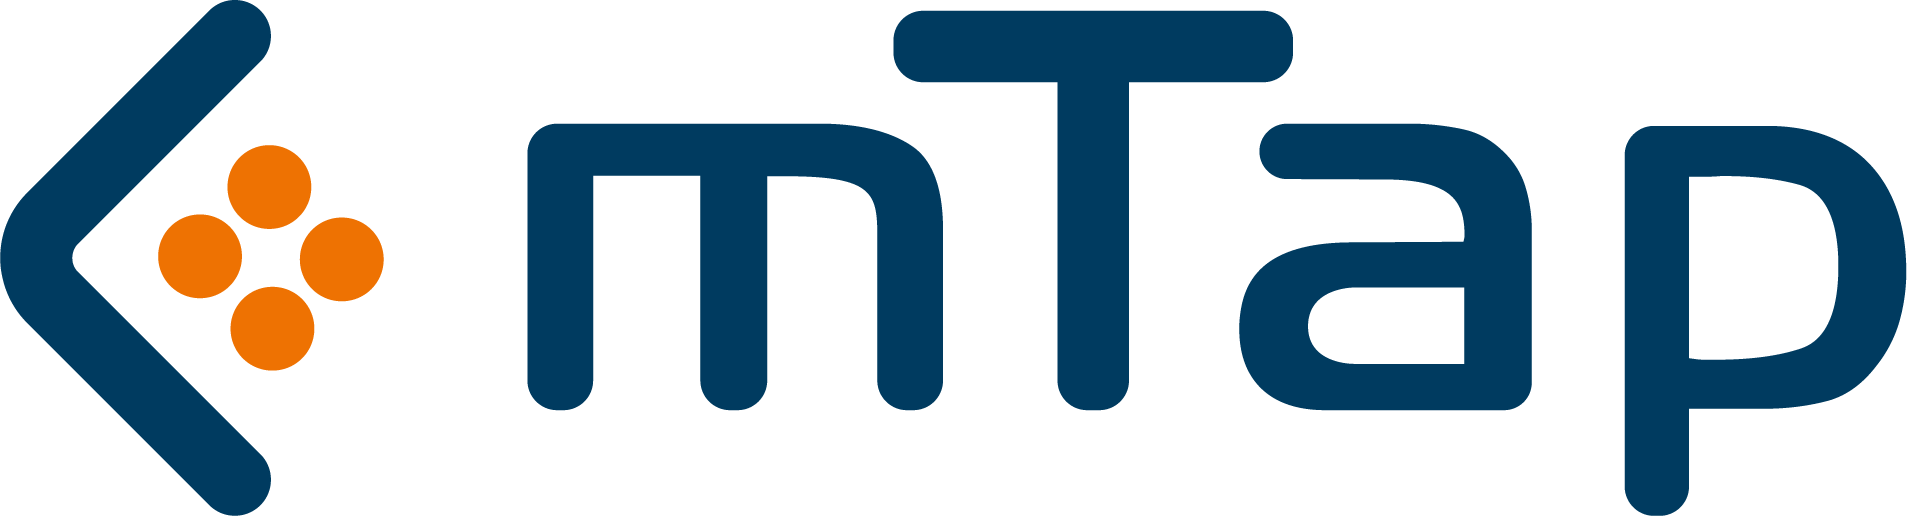 mTap Smart City